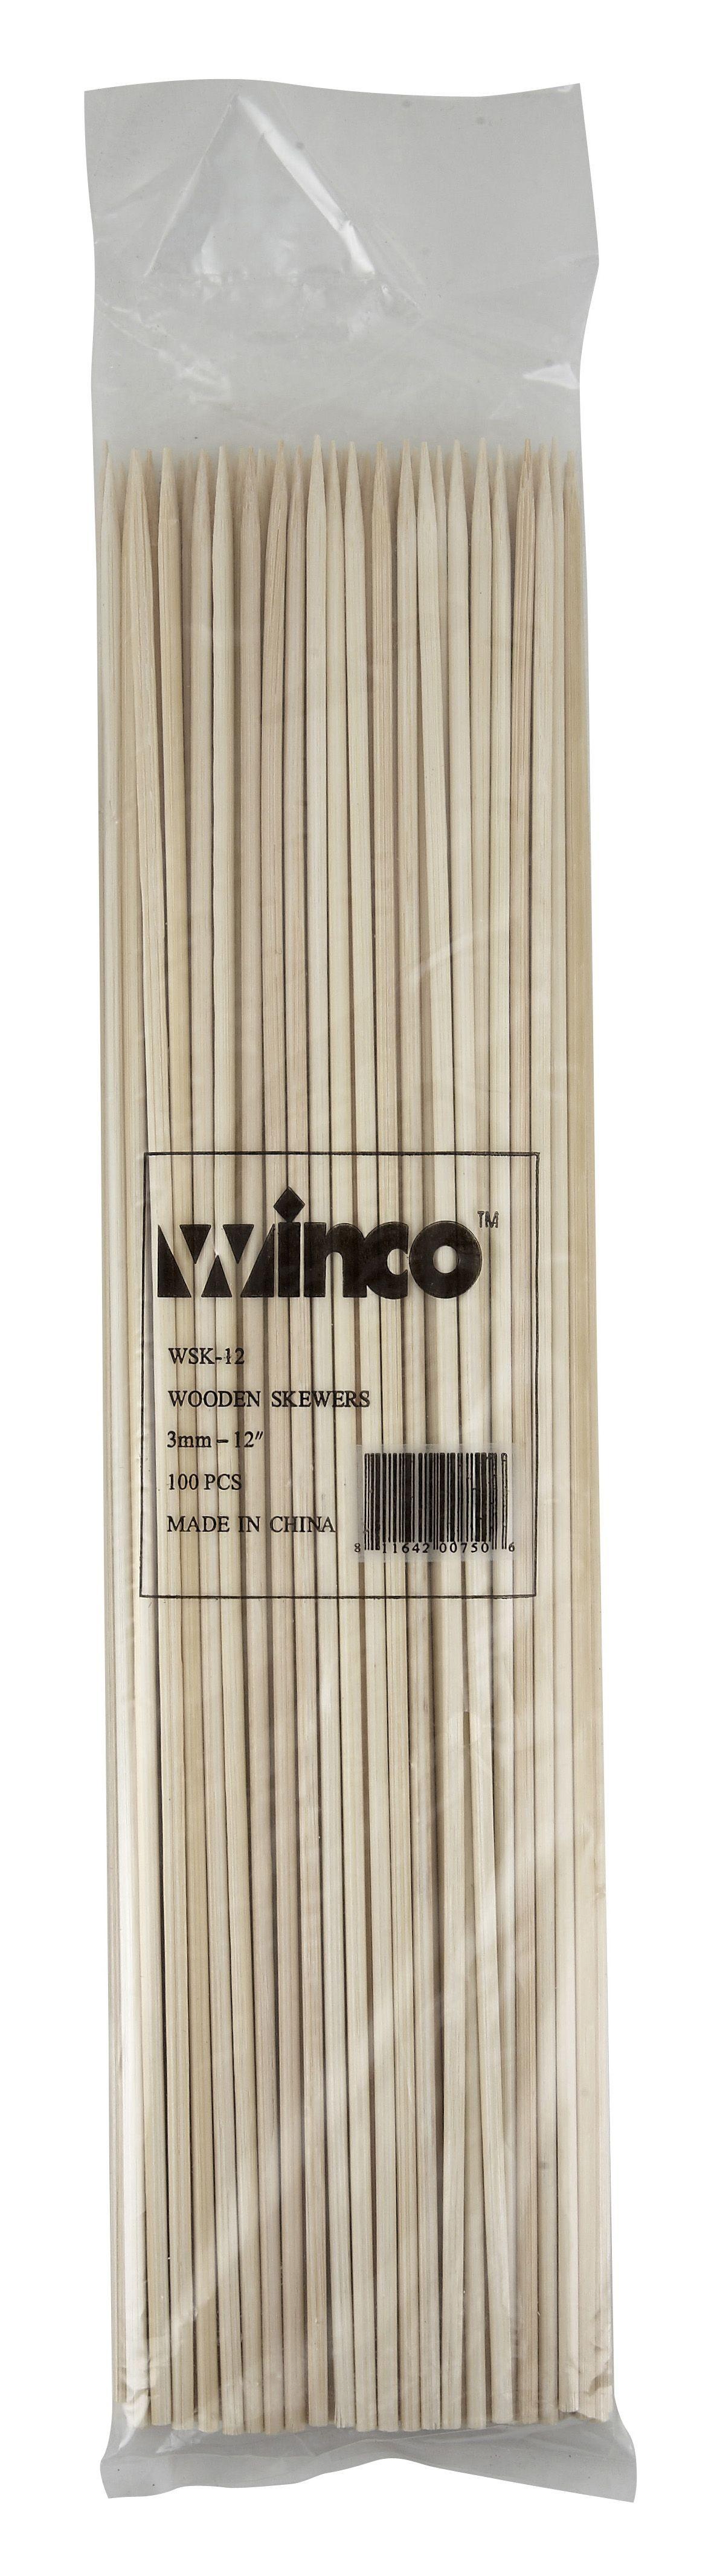 "Winco WSK-12 Bamboo Skewers 12"""